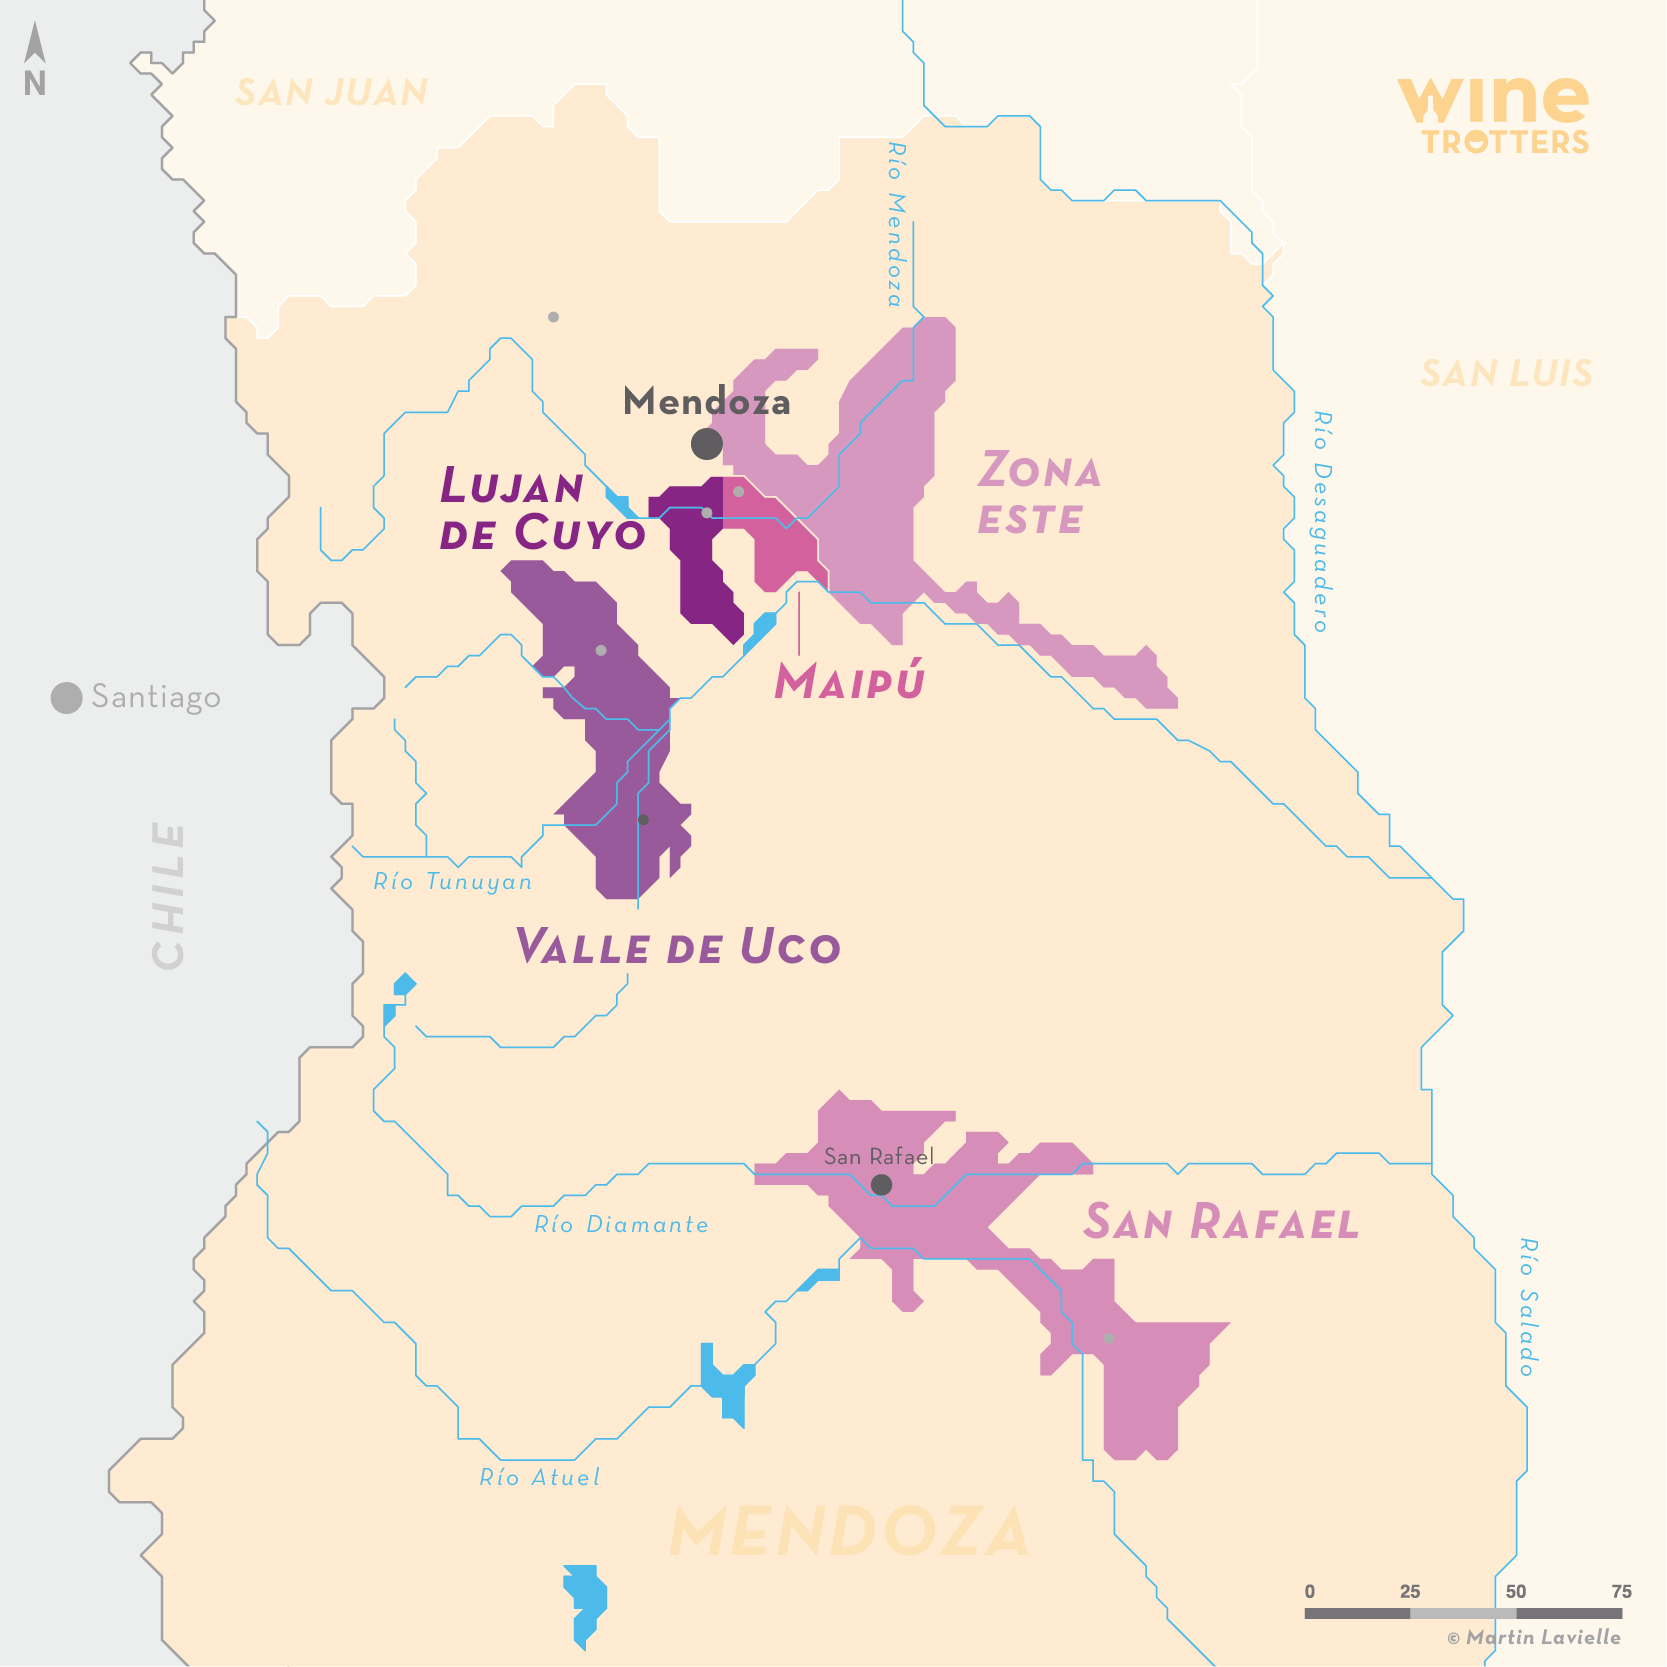 Wine-Trotters_wine-oenotourism_tourisme_map-wine_mapa-vino_carte-vin_Argentina-Mendoza_WEB